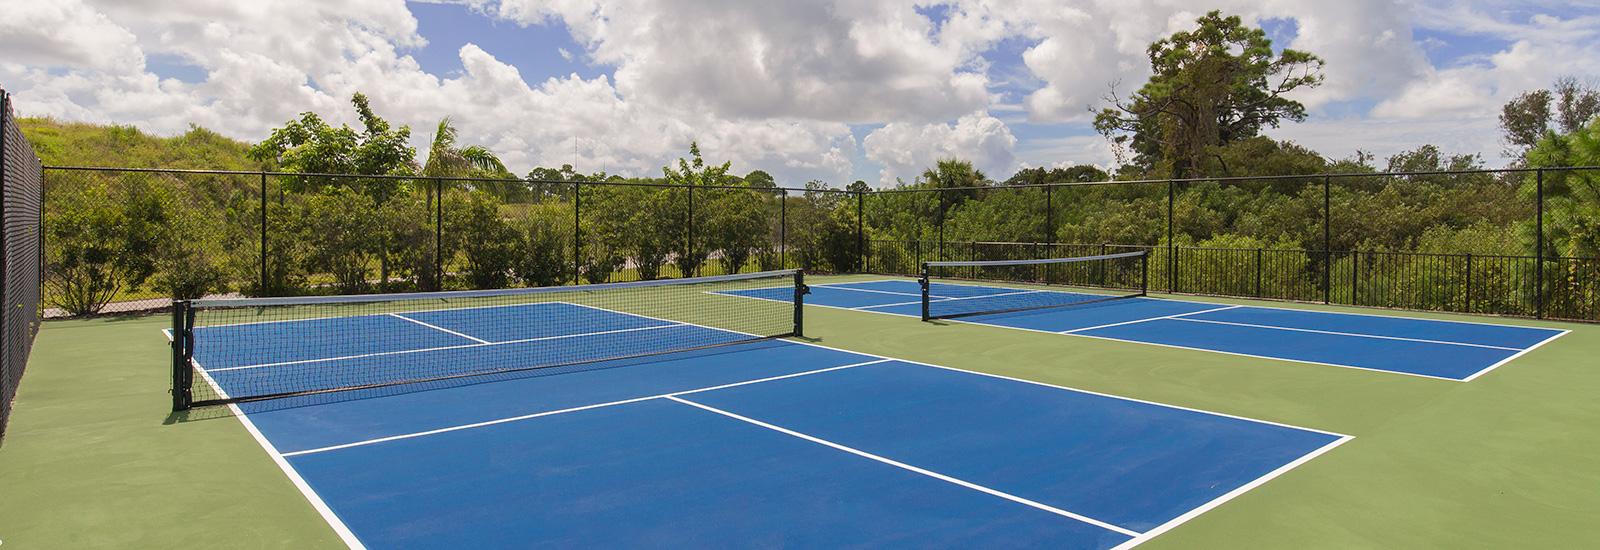 1600x550-CoralCaye-tennis.jpg